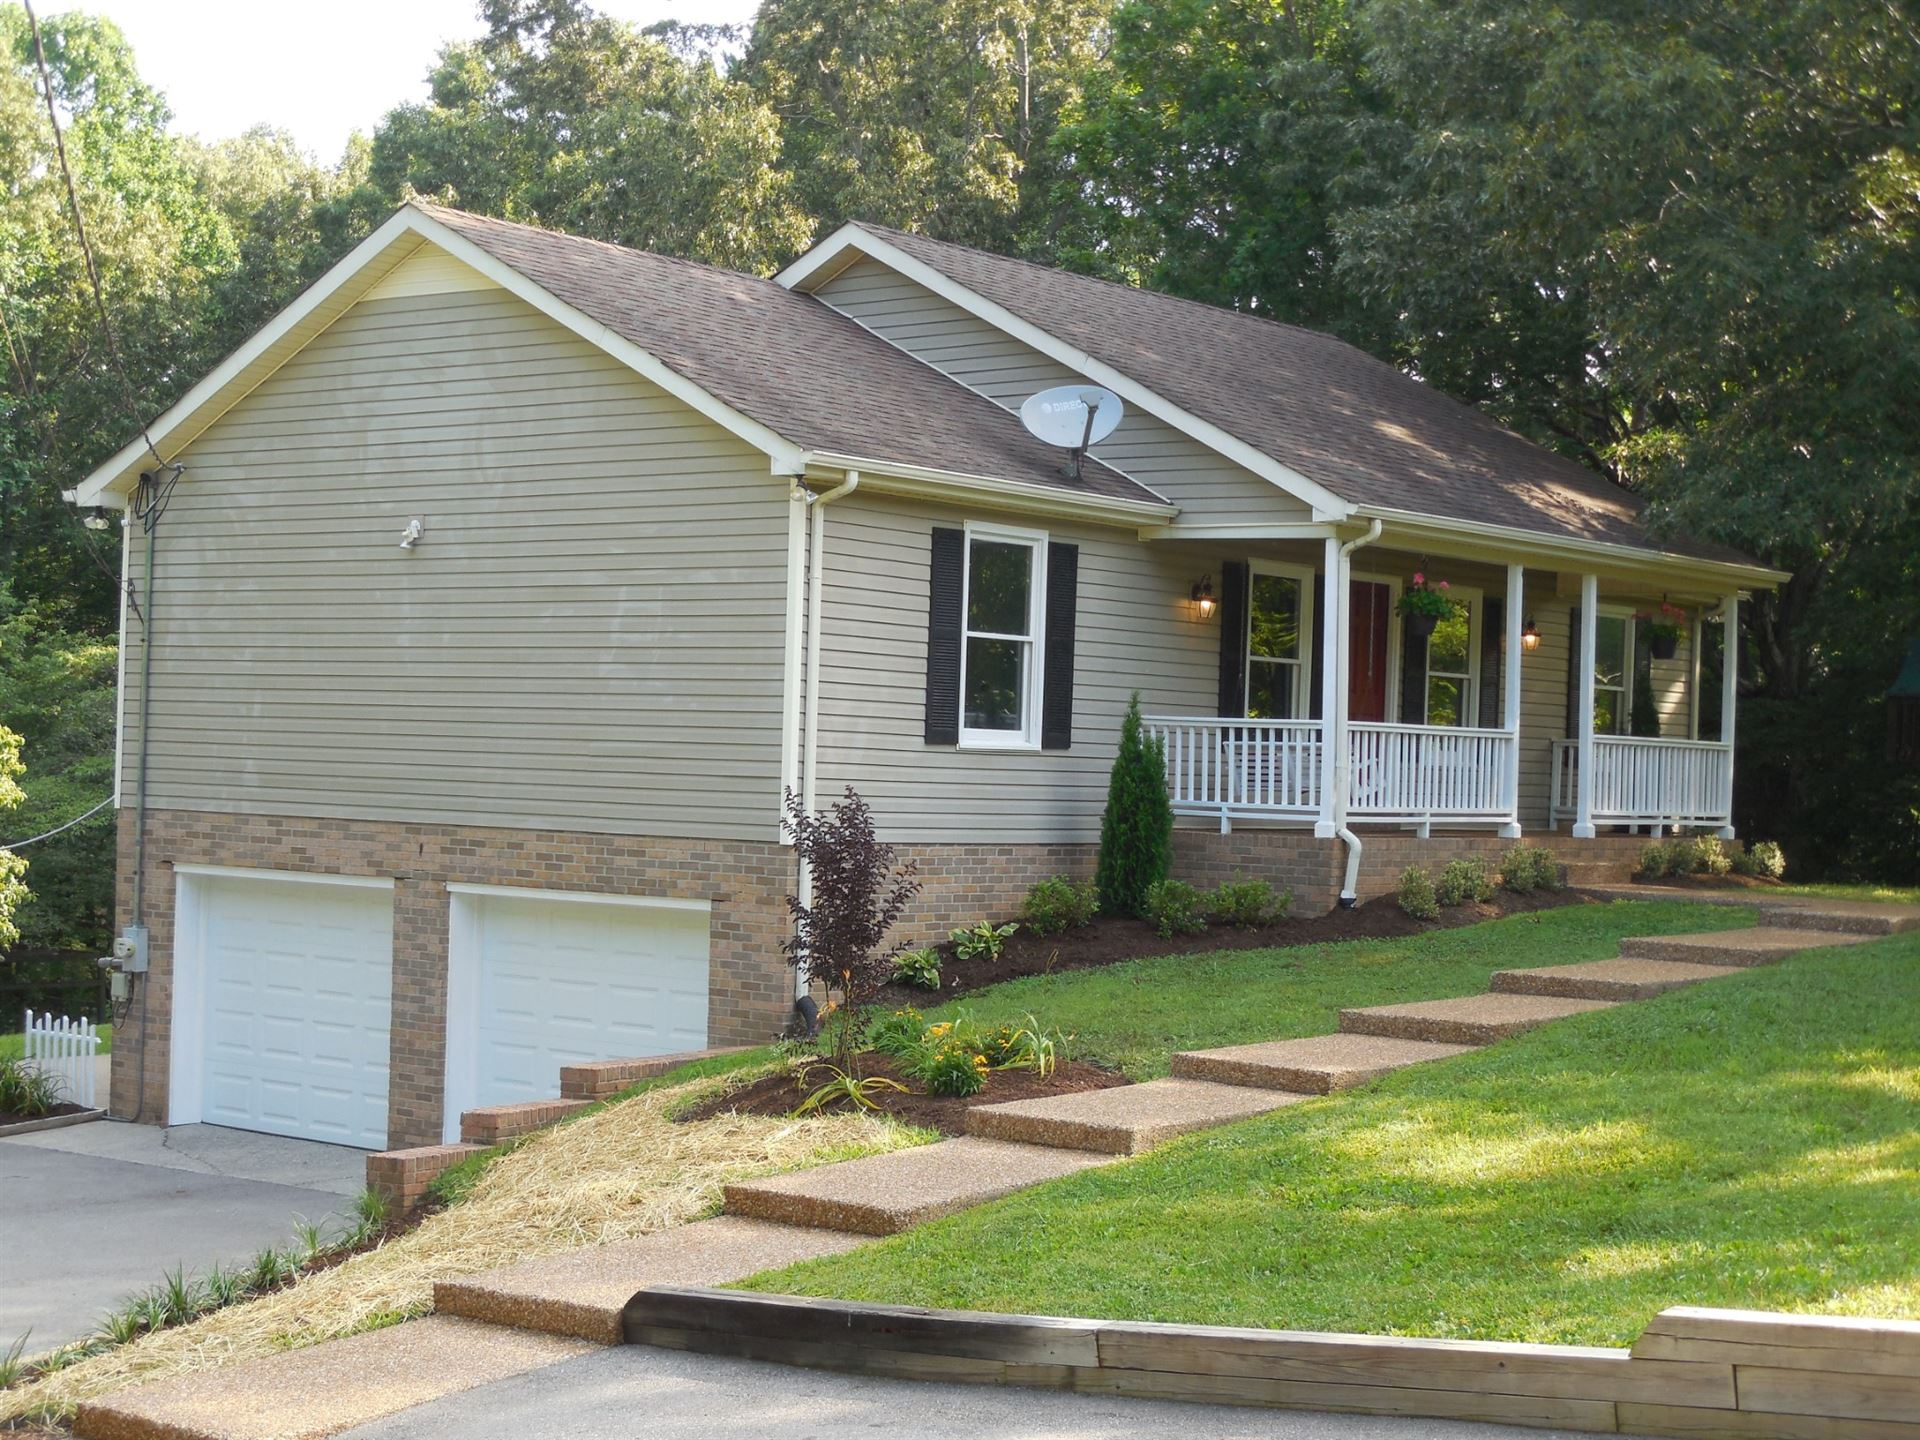 7397 Forrest Glen Road, Fairview, TN 37062 - MLS#: 2262408